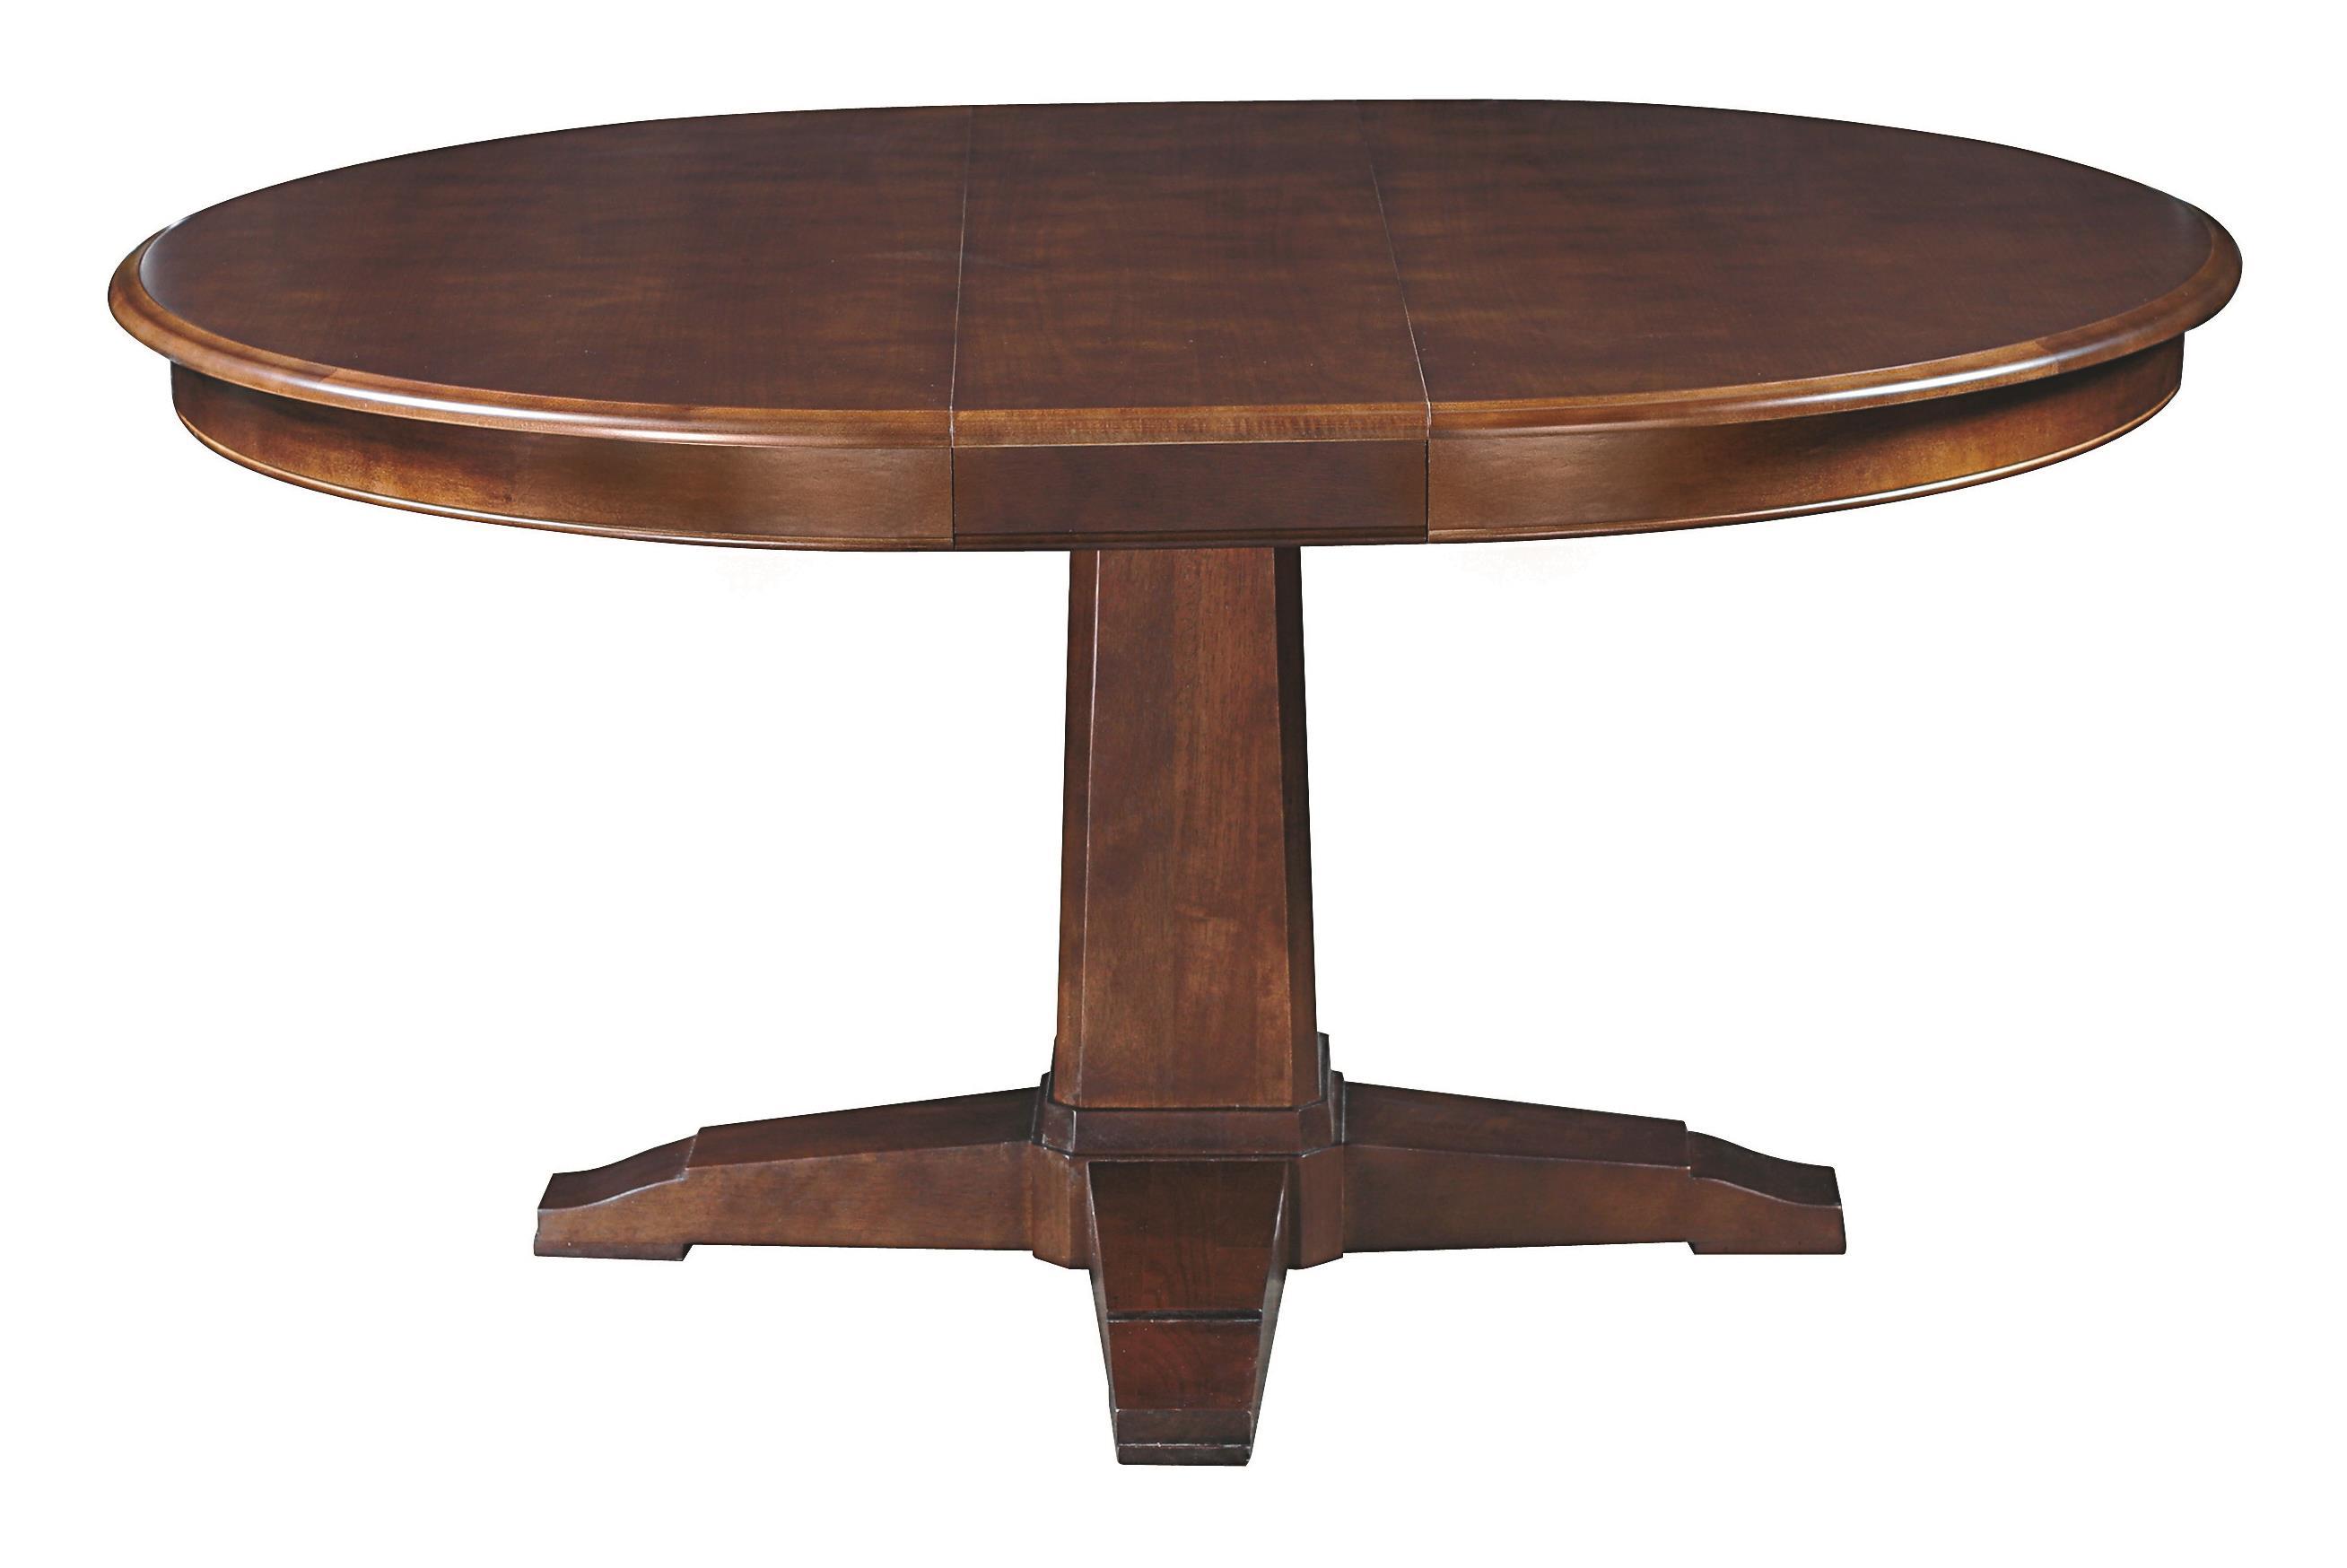 Custom Dining Customizable Round Pedestal Table by Bassett at Bassett of Cool Springs